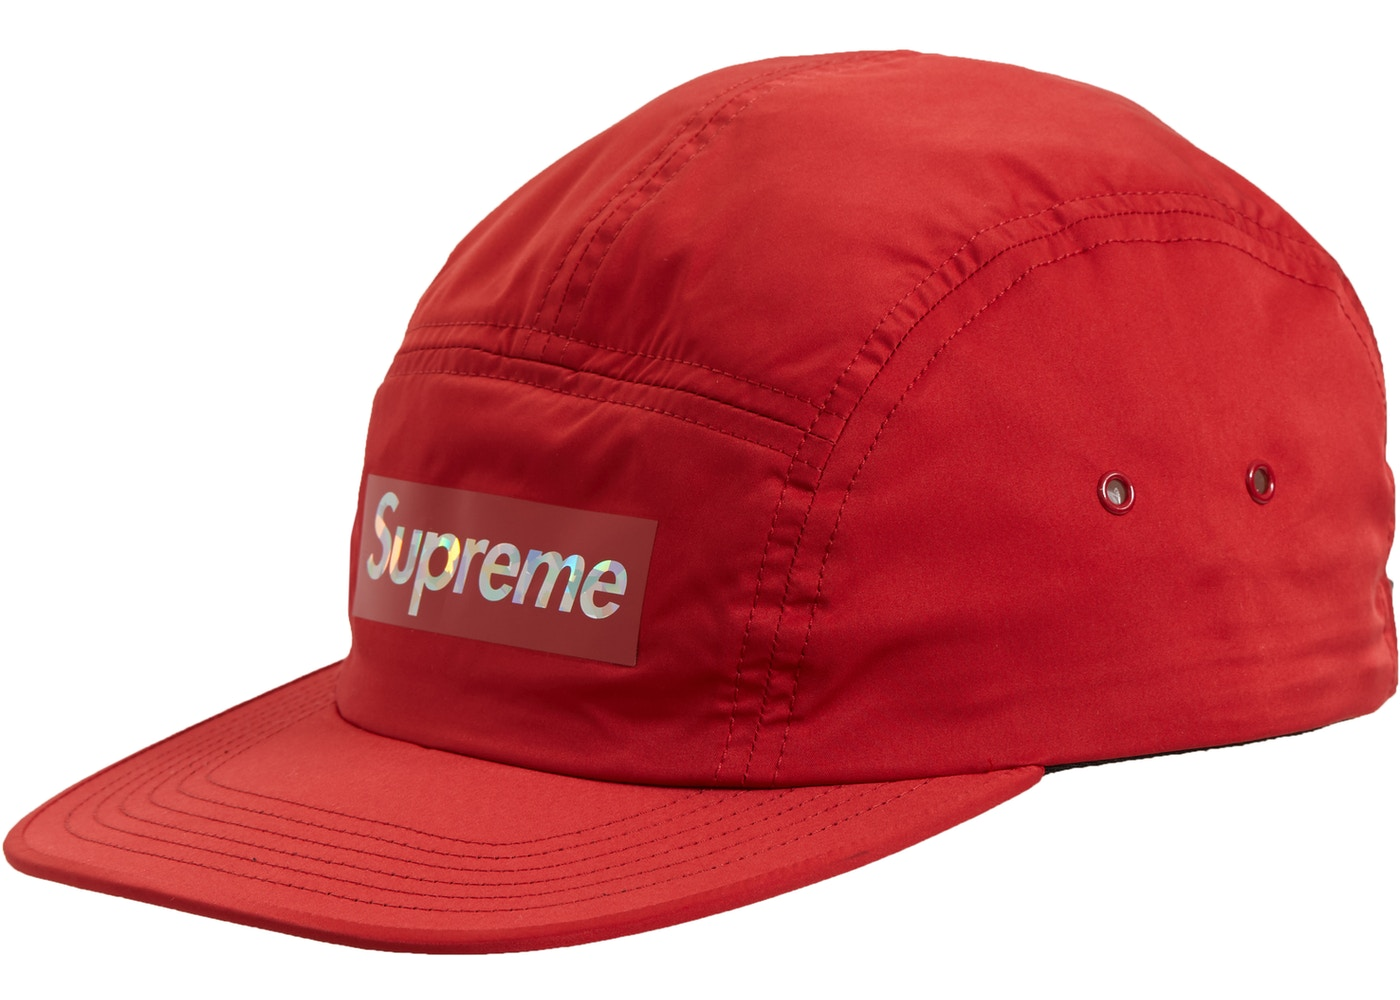 02503c6c Supreme Holographic Logo Camp Cap Red - SS19